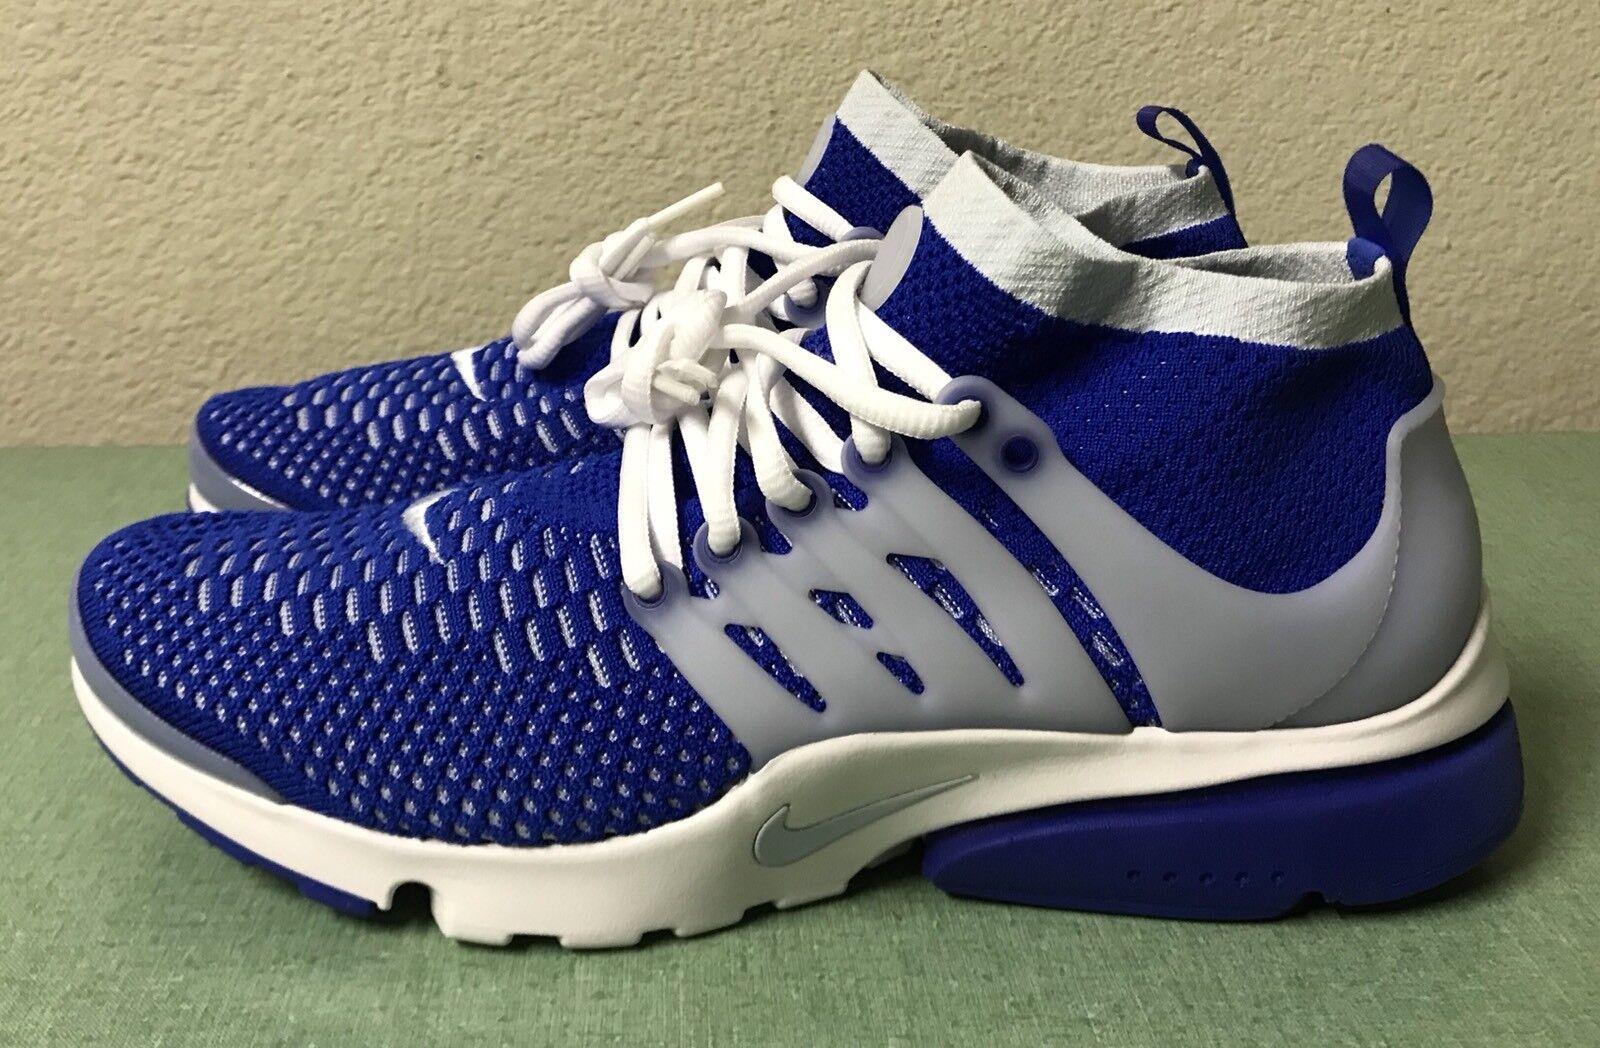 Nike Air Presto Ultra Flyknit Racer bluee Grey White Mens Sz 9.5 Running shoes